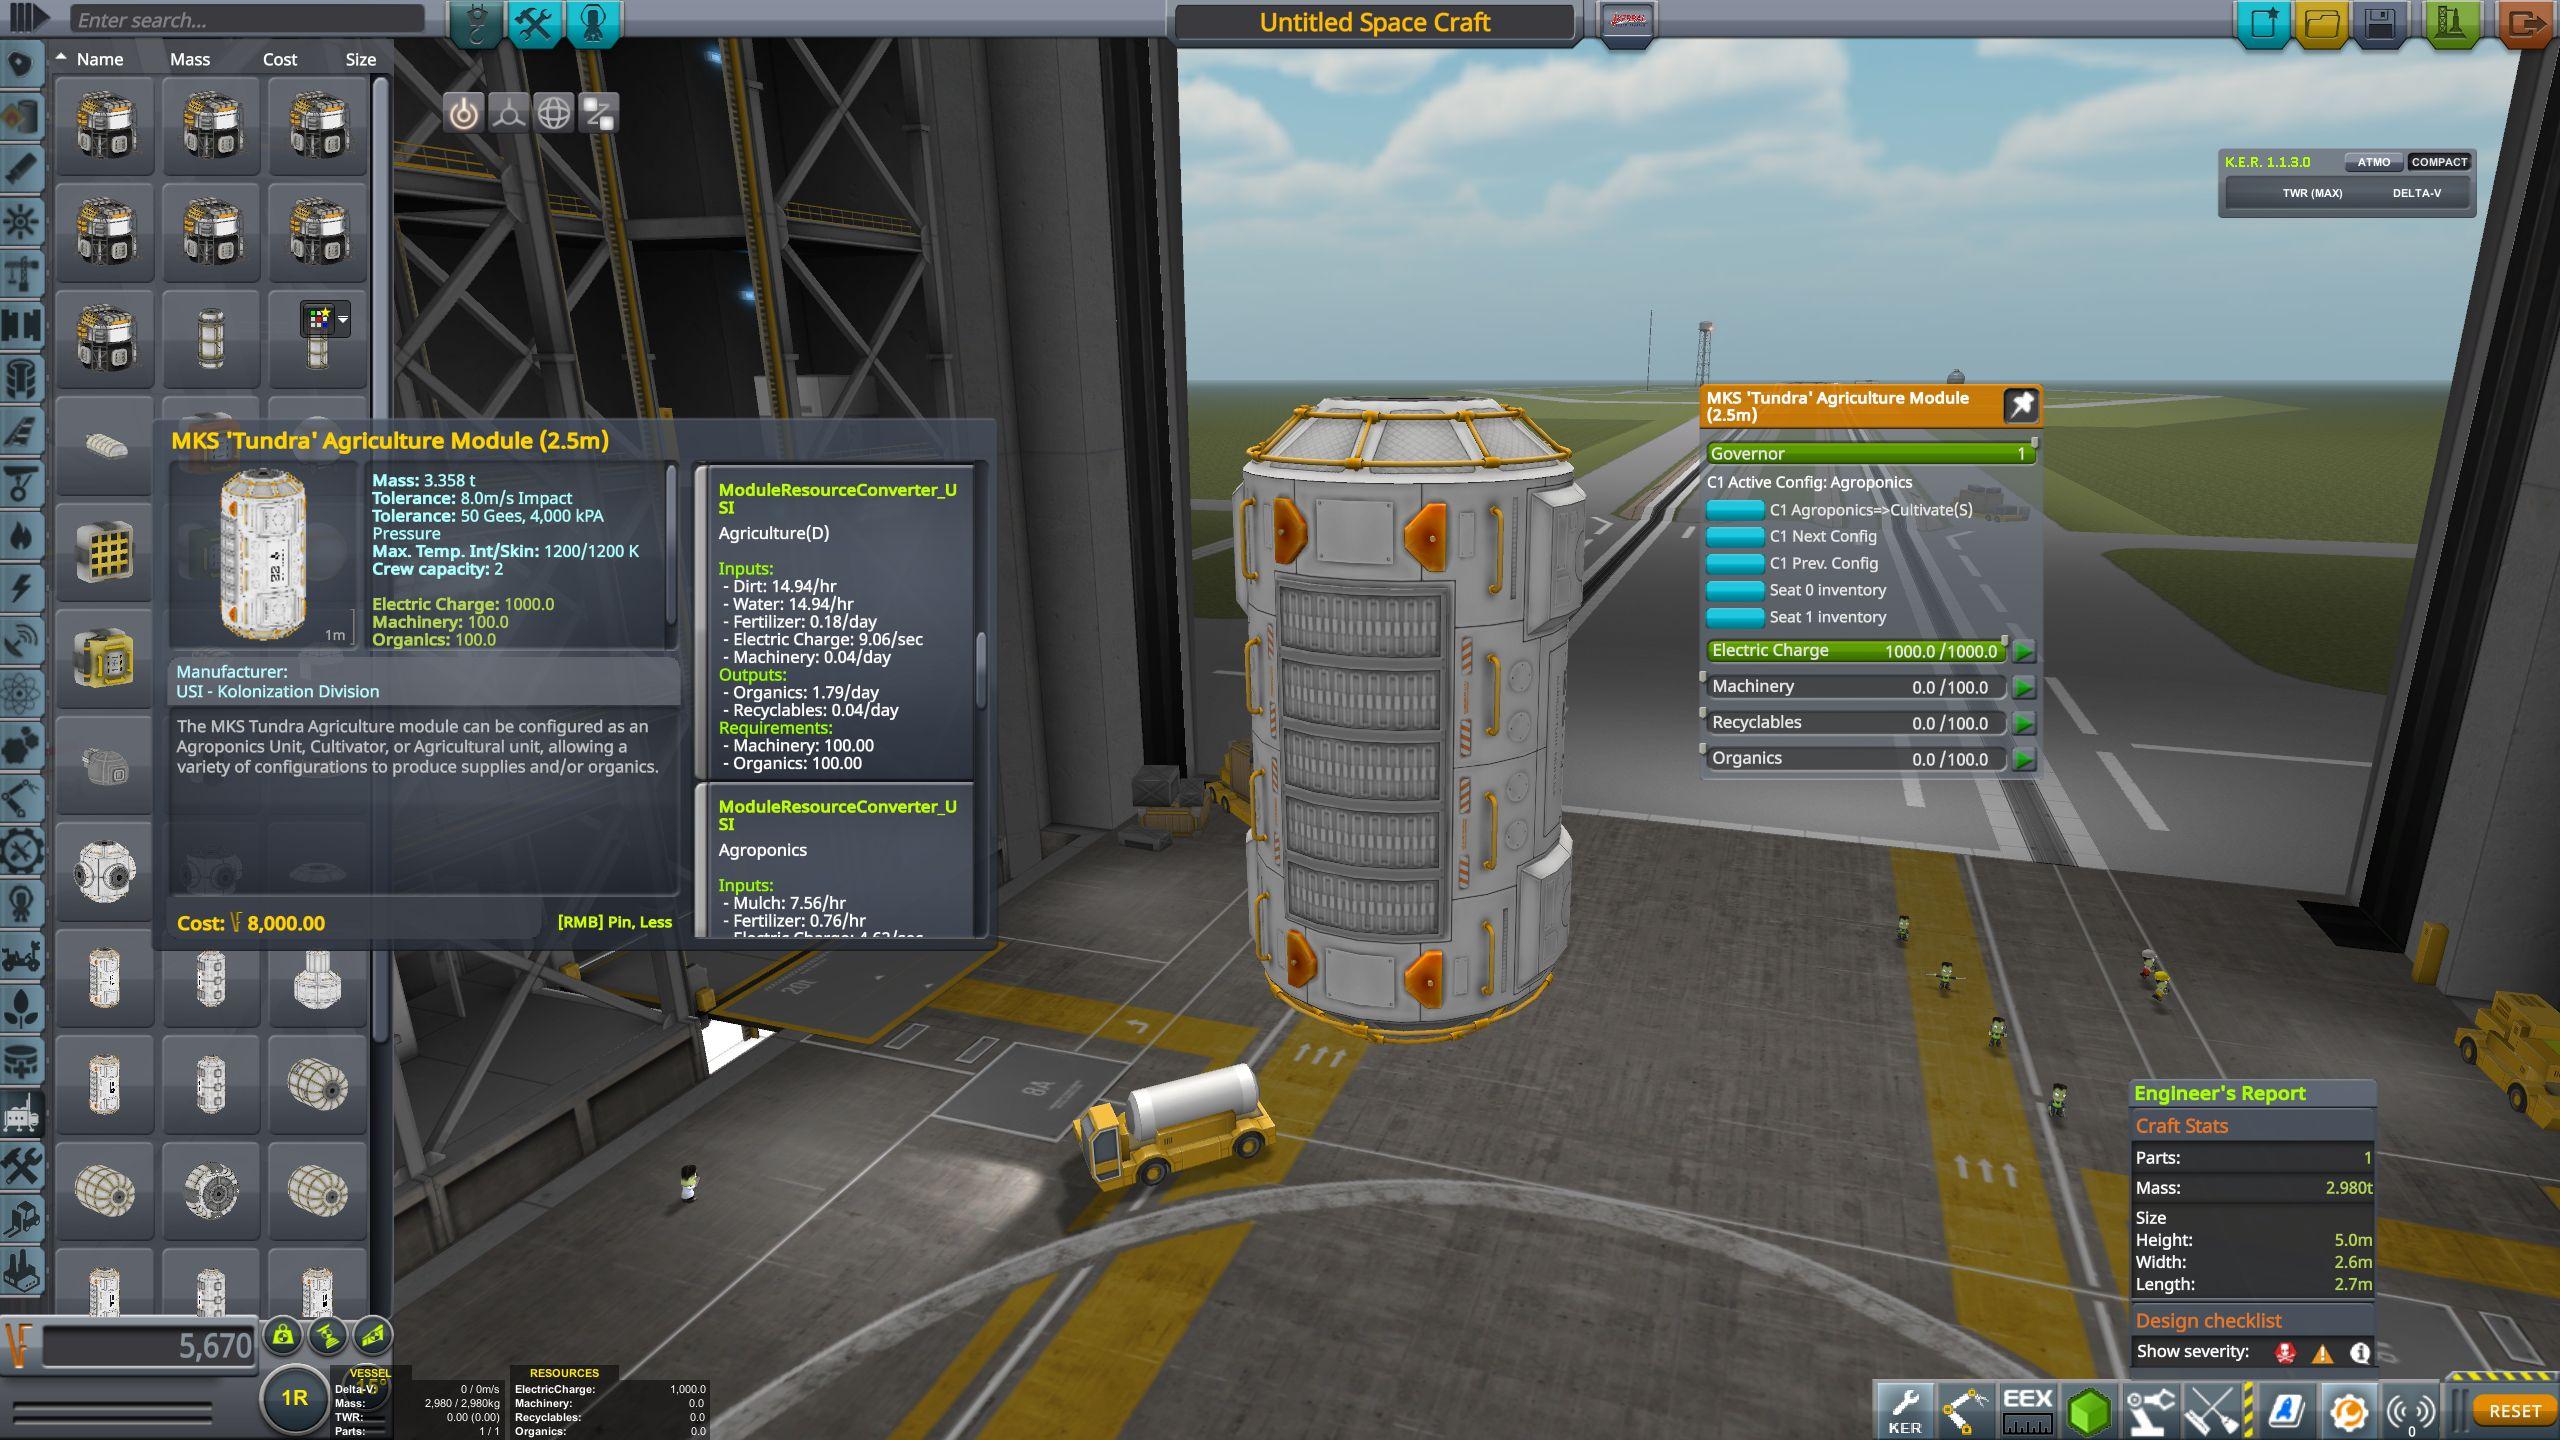 Minmus地表に引き籠もるUSI編 - Kerbal Space Program AAR Wiki*